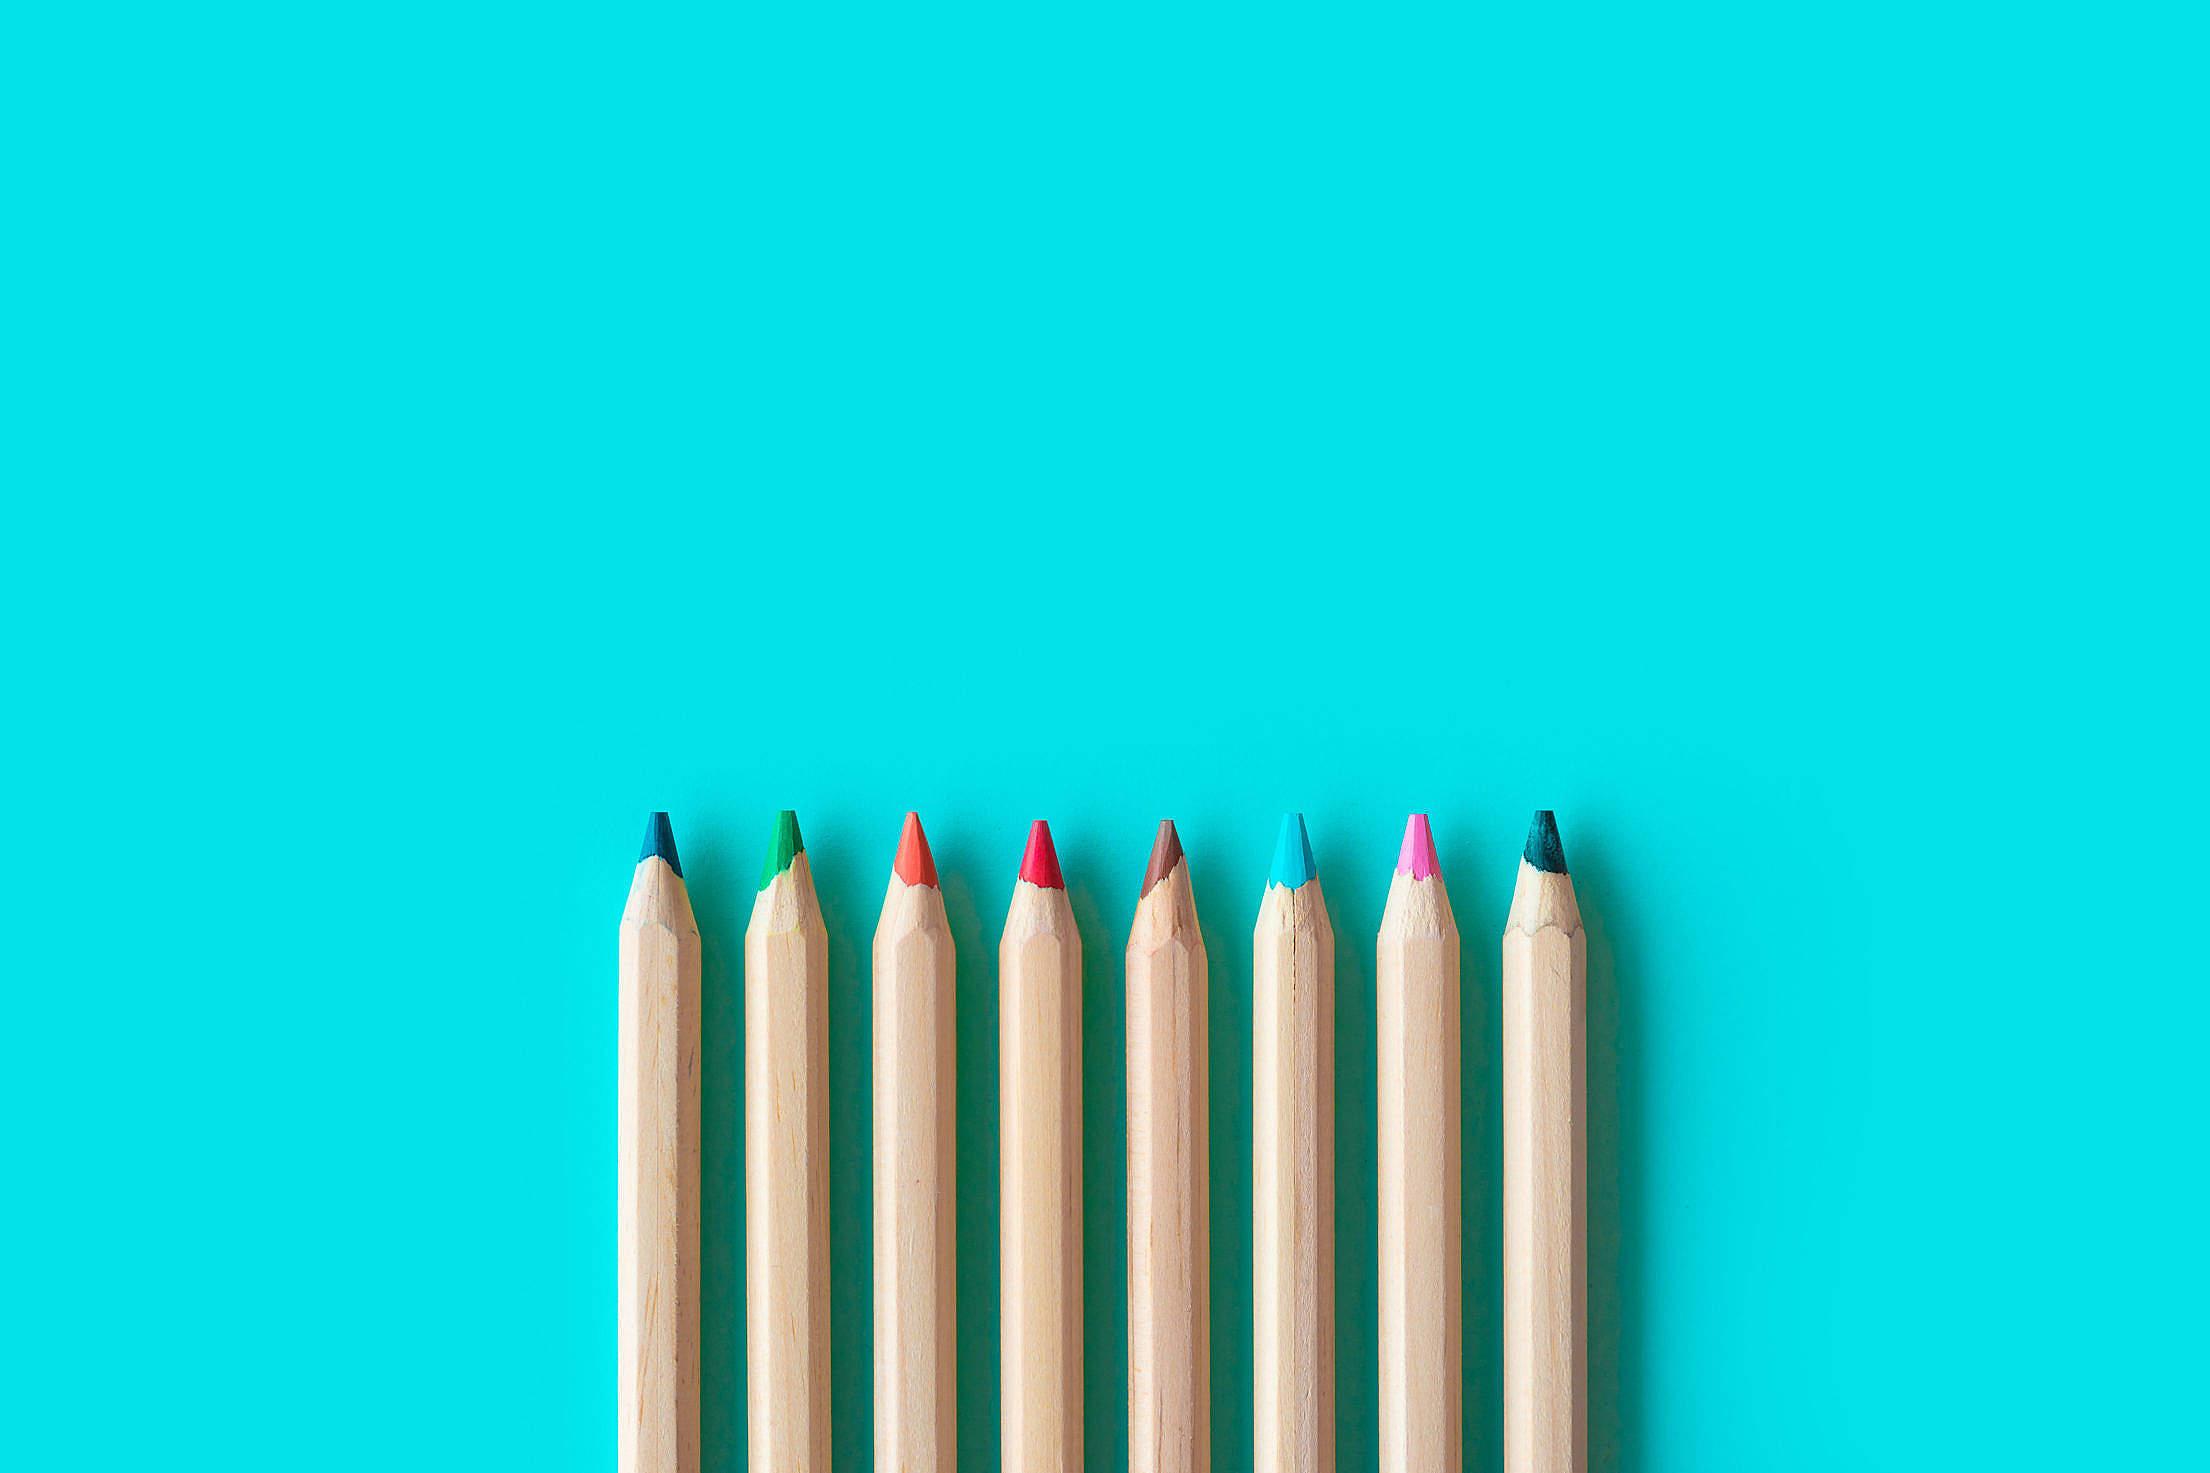 Colored Pencils Free Stock Photo